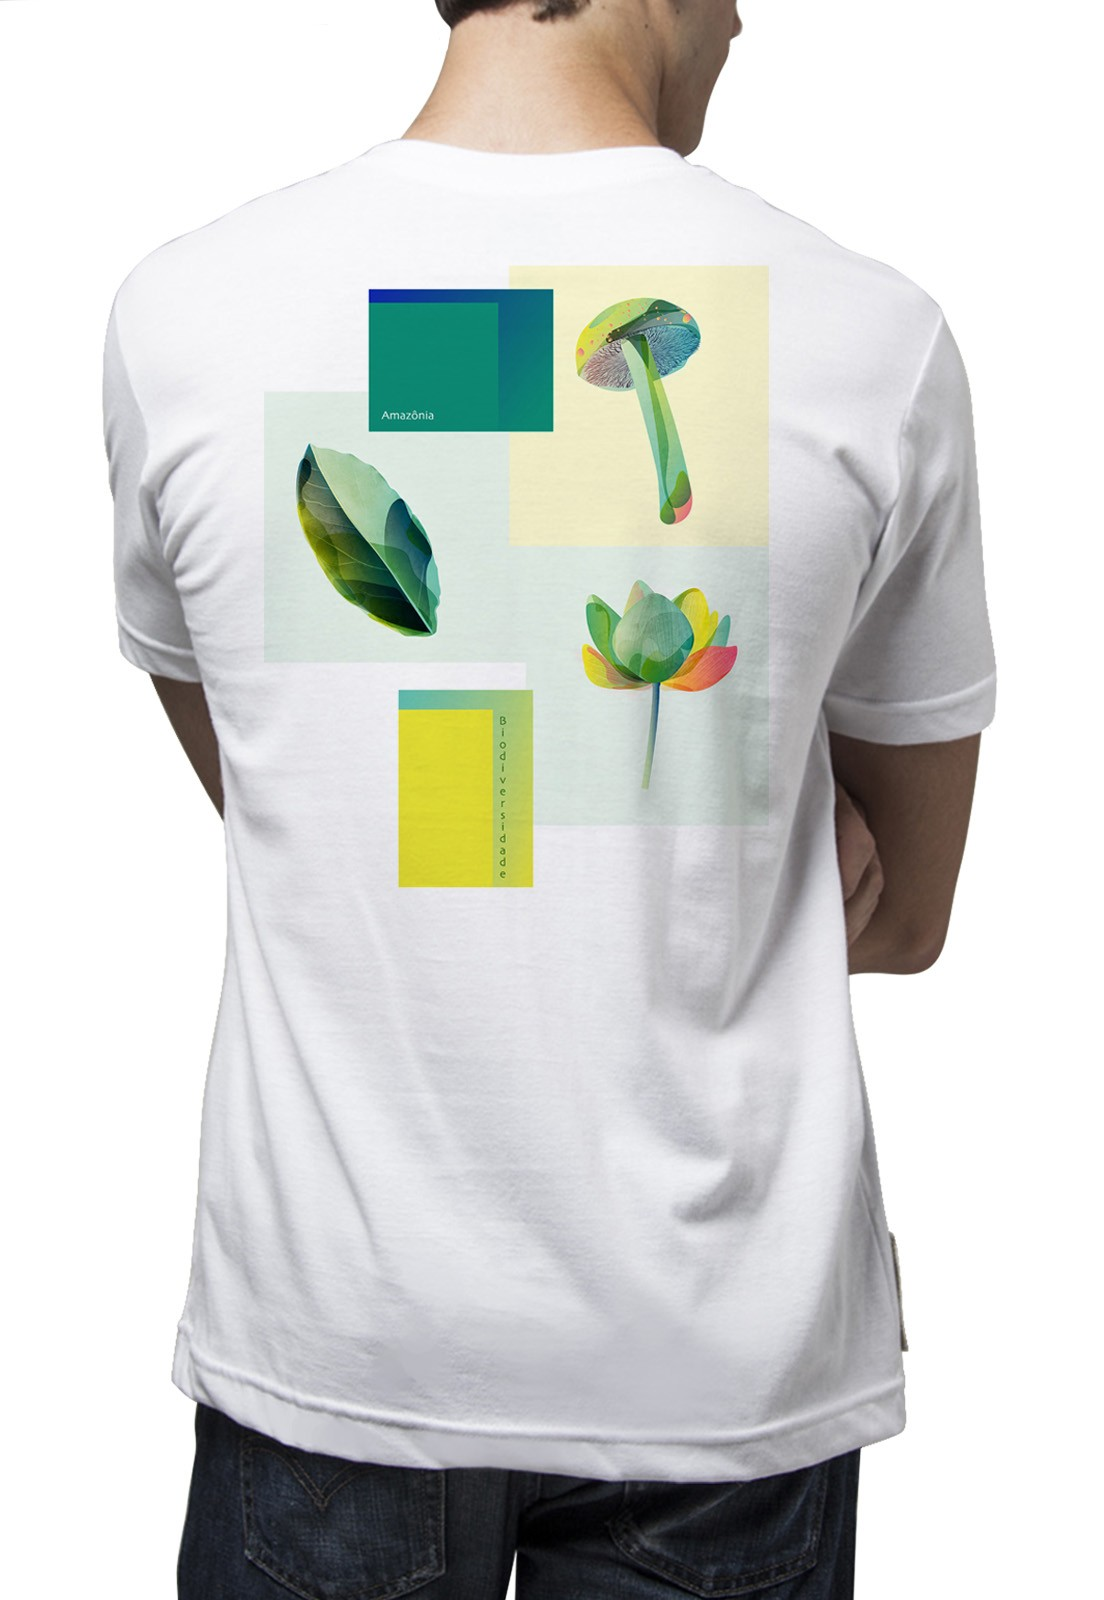 Camiseta Amazônia Bioplantas - Branco